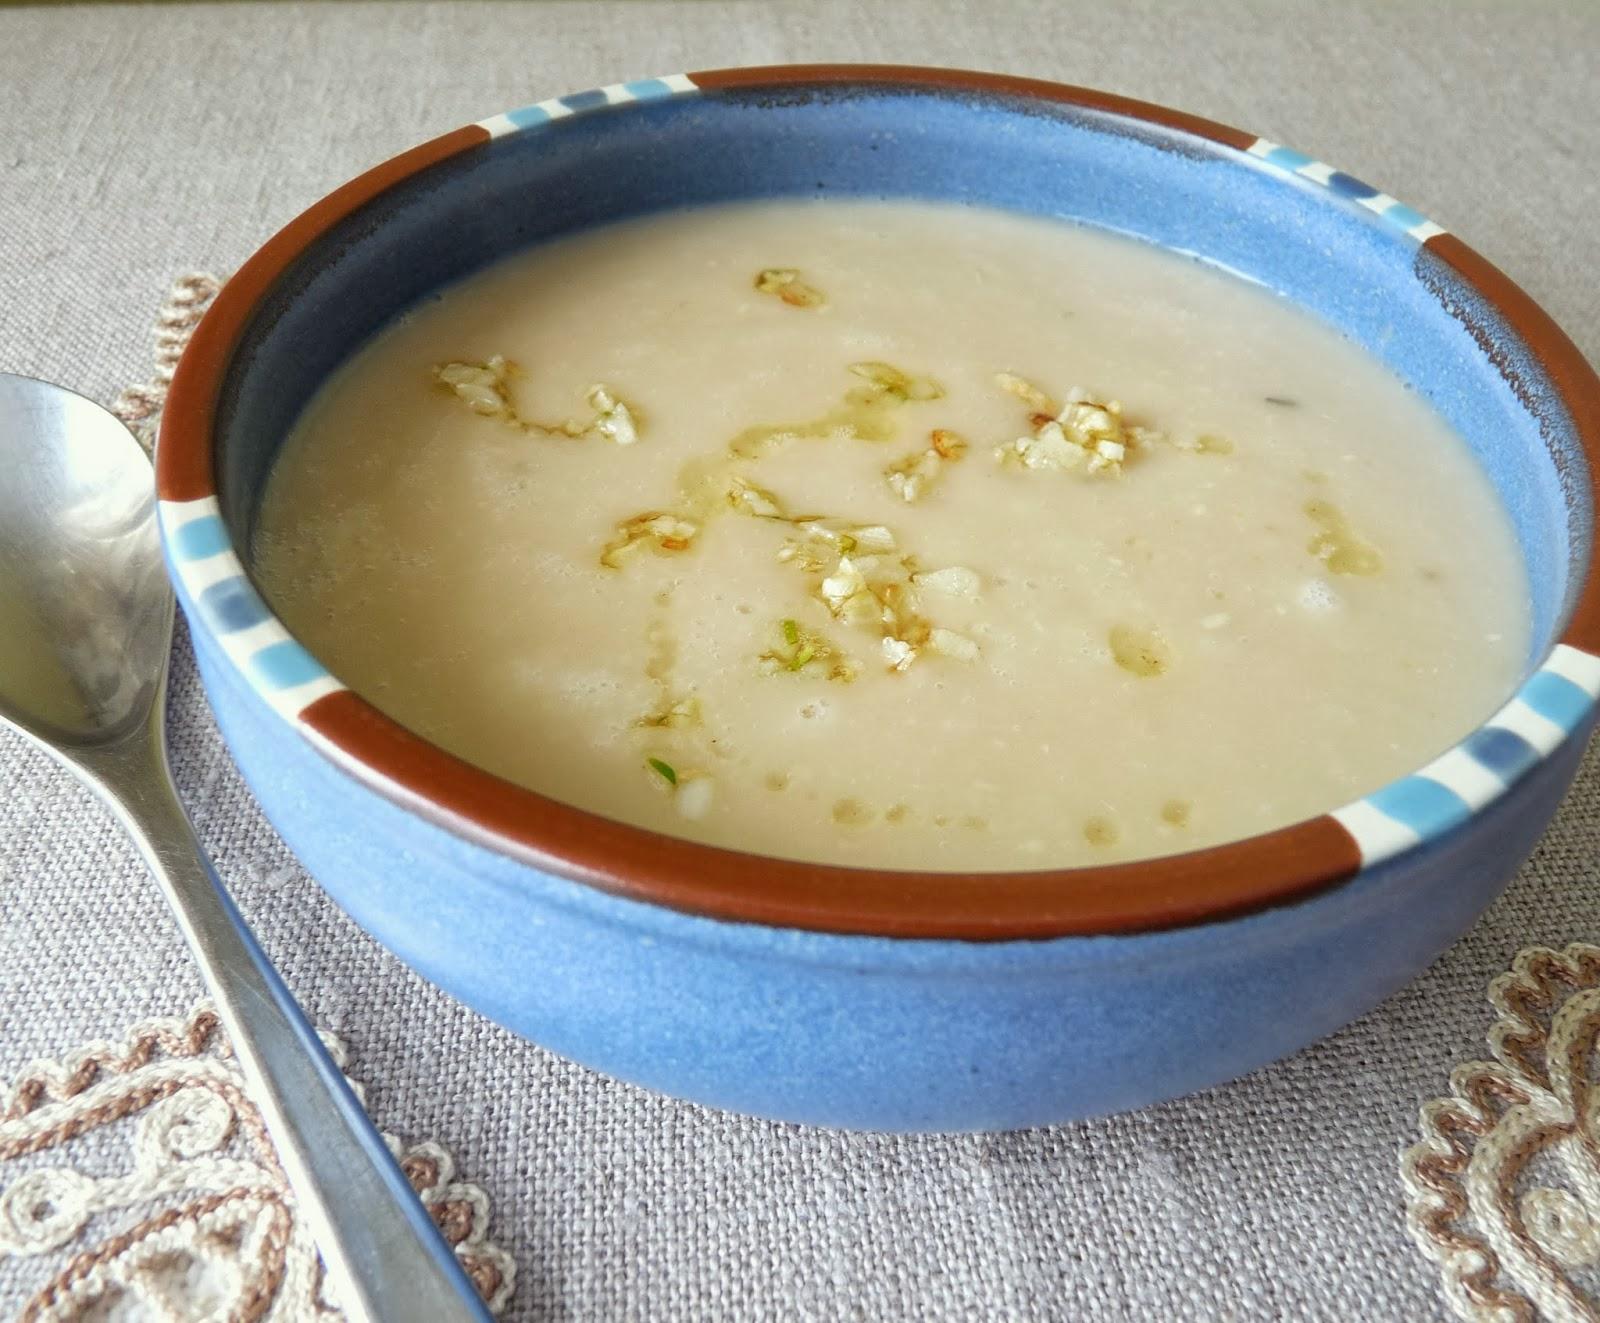 Roasted Garlic & Bean Soup